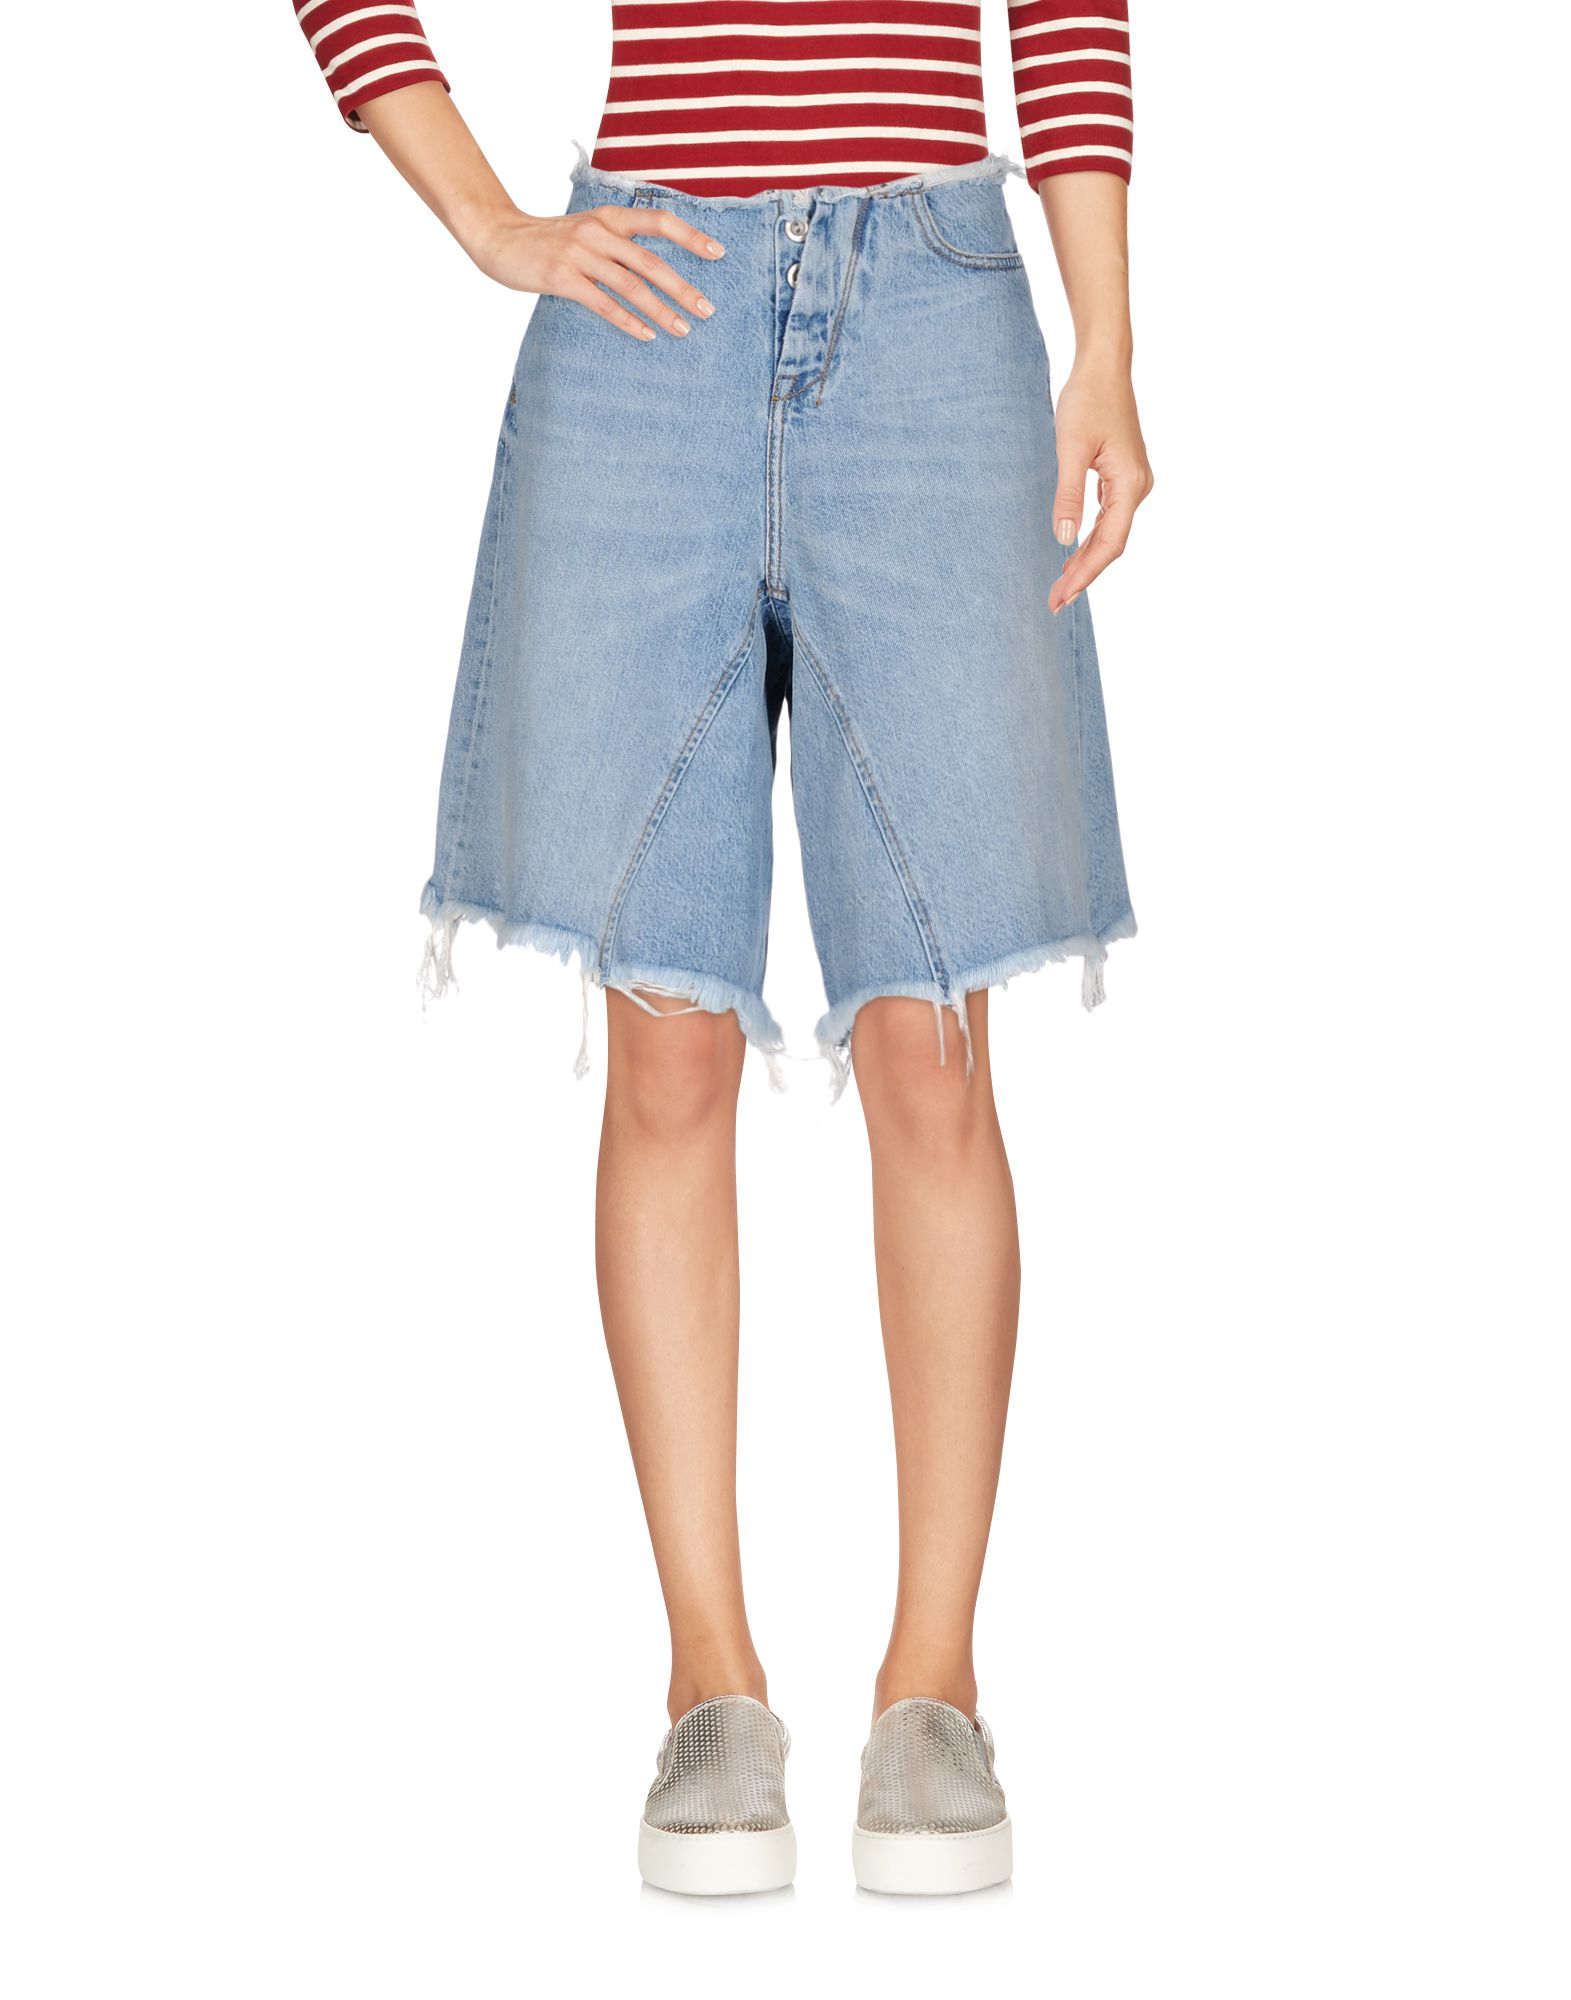 Shorts Jeans Ben Taverniti™ Unravel Project Donna - Acquista online su sBpKX